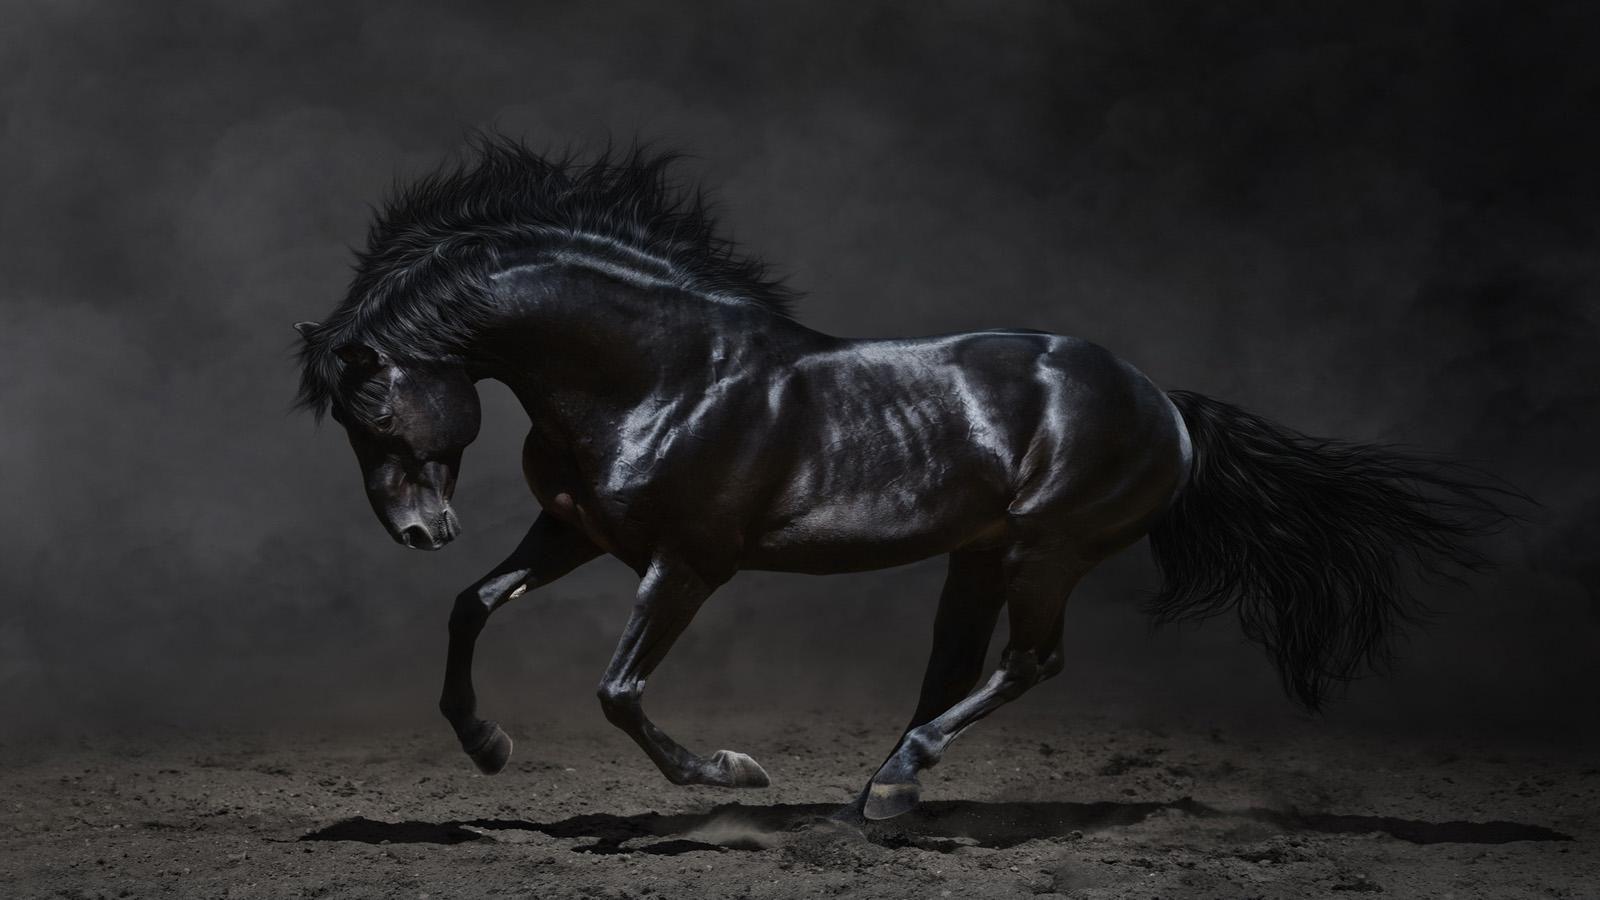 Wonderful Wallpaper Horse Gothic - cbb9c2be1bef3206a52baf4018768a9a  You Should Have_1003150.jpg